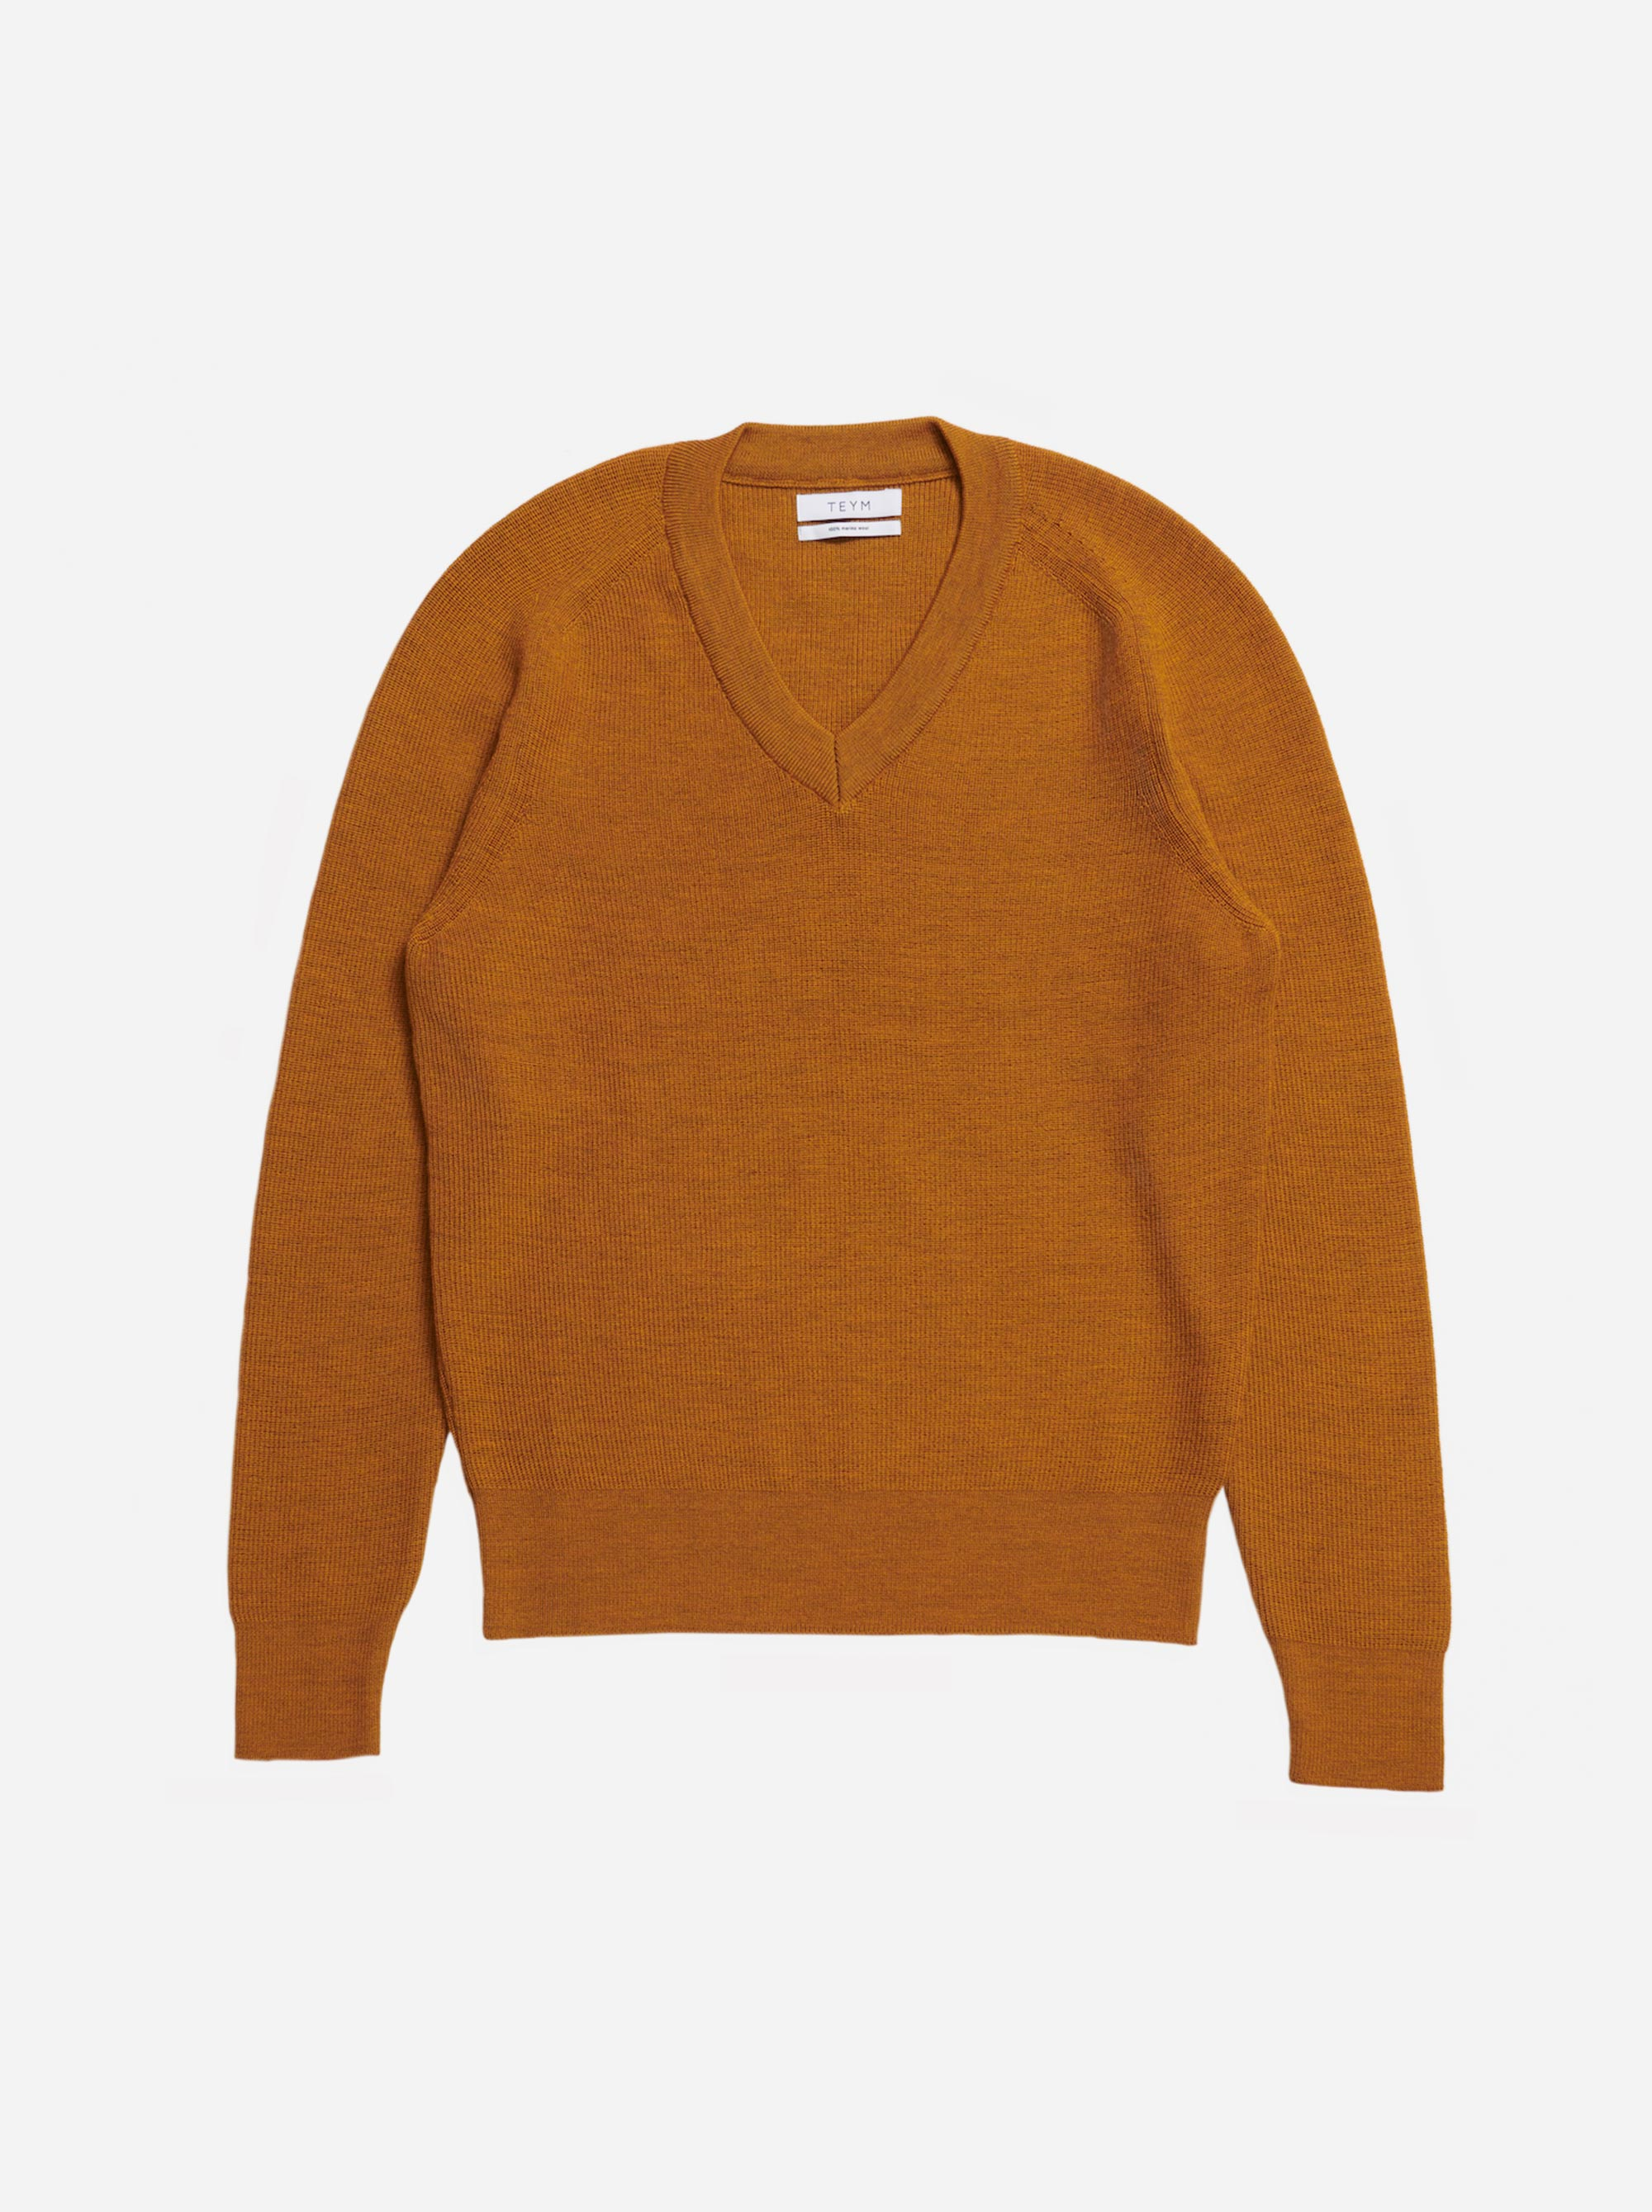 Teym - V-Neck - The Merino Sweater - Women - Mustard - 4